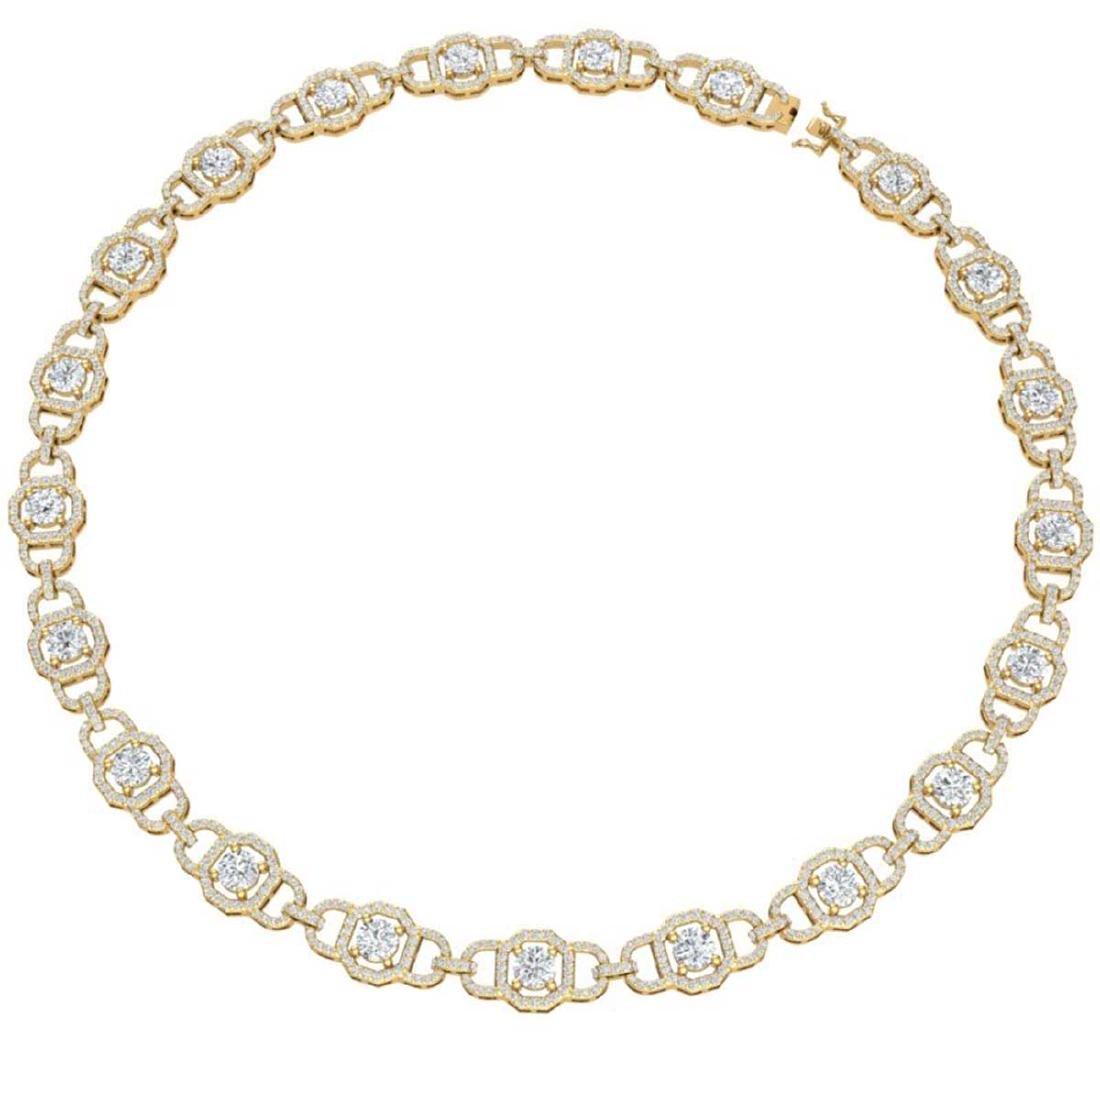 25 CTW Certified SI/I Diamond Halo Necklace 18K Yellow - 3